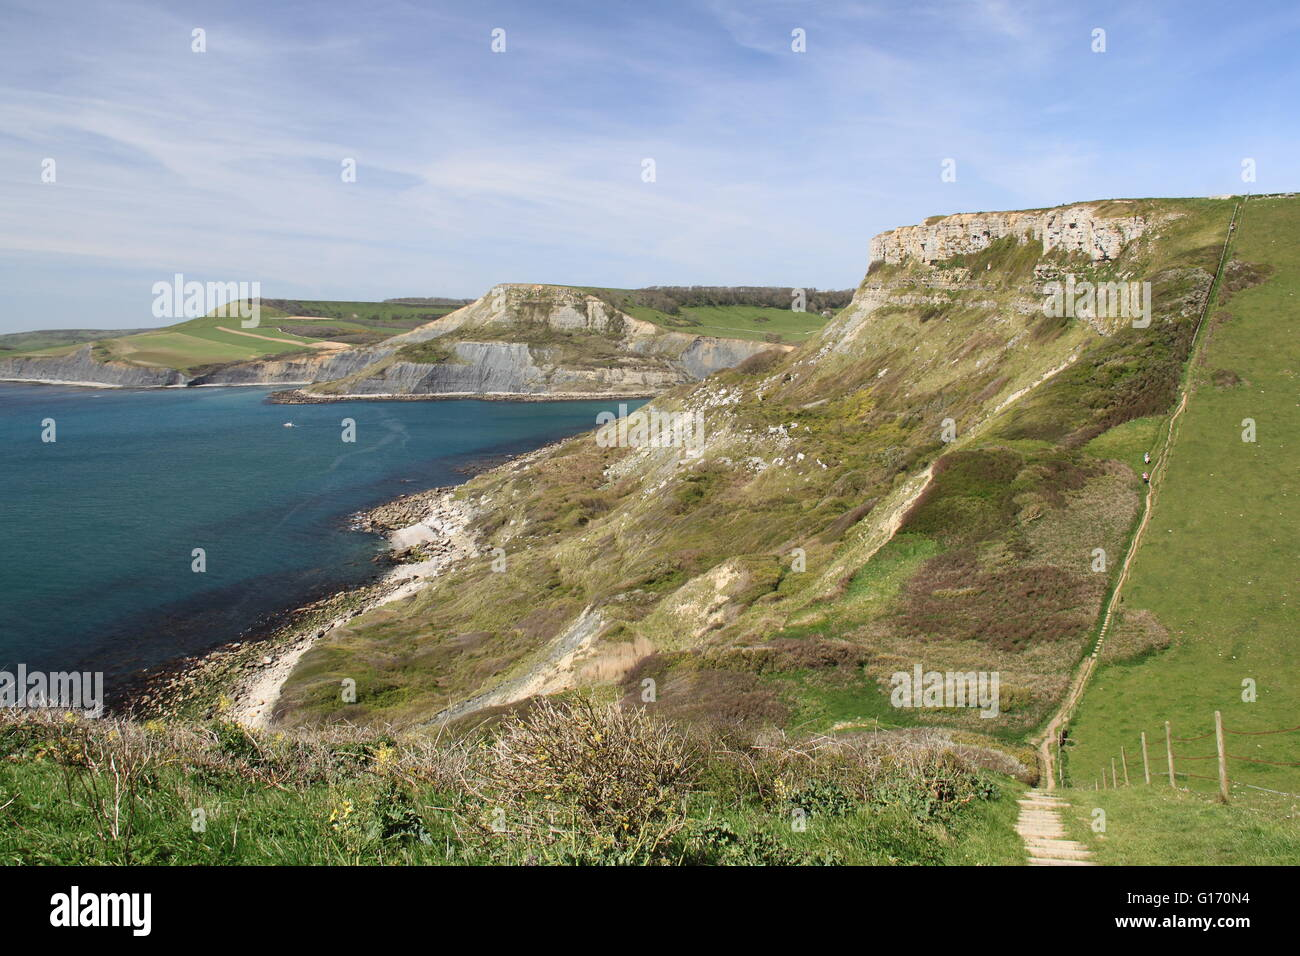 Emmetts Hill, Worth Matravers, Corfe, Purbeck, la Costa Jurásica, en Dorset, Inglaterra, Gran Bretaña, Reino Unido, UK, Europa Foto de stock